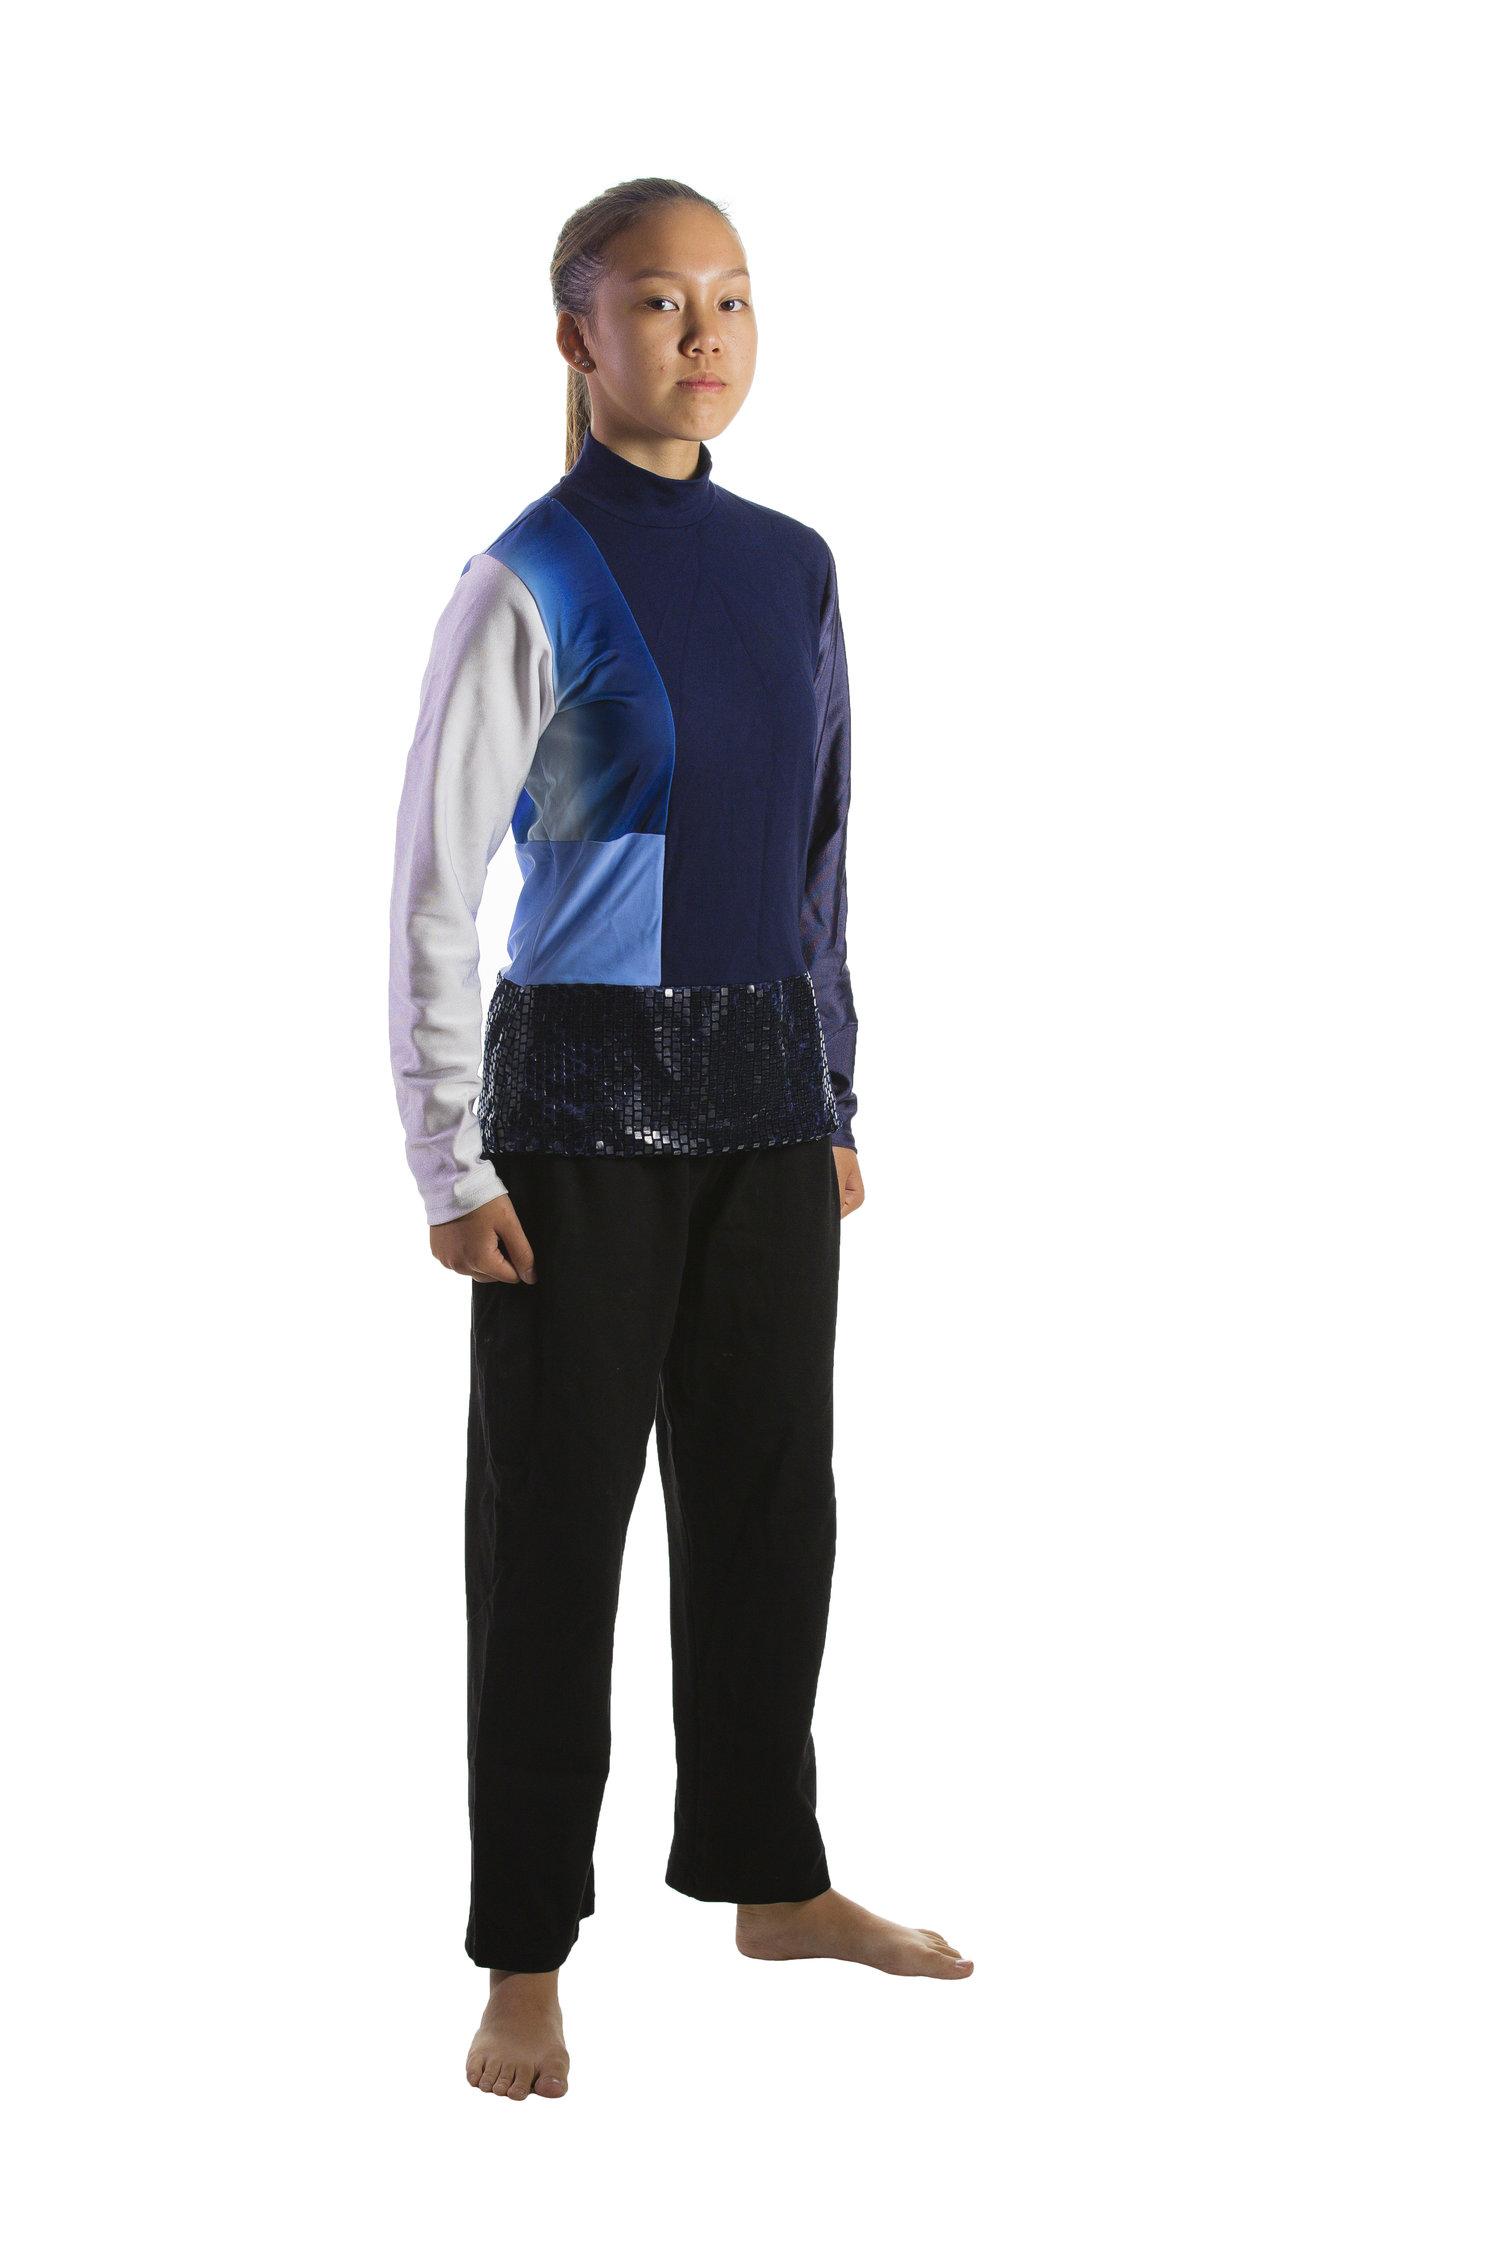 Weightless Arcadia Uniform Amp Prop